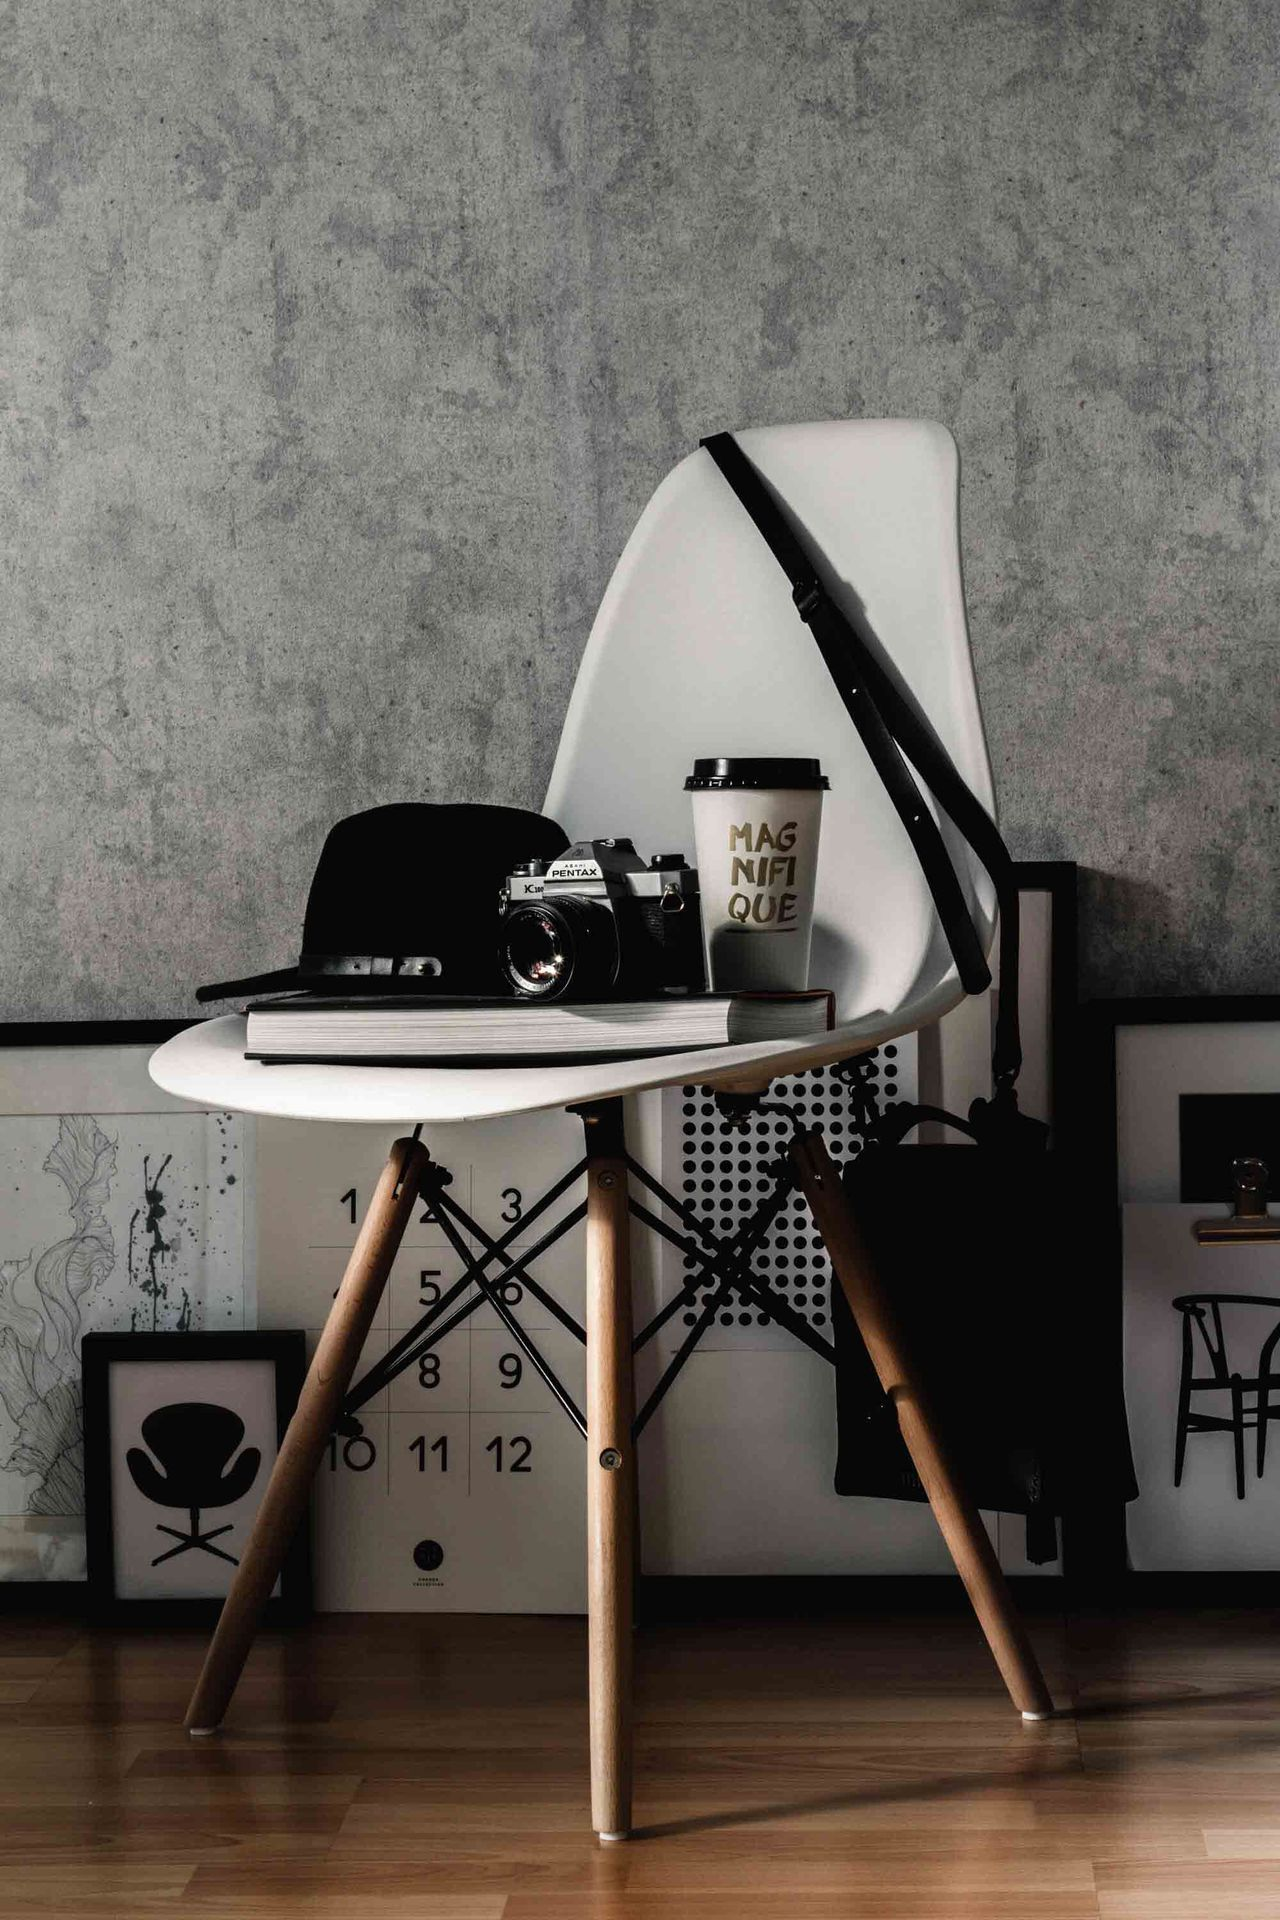 Old-fashioned Retro Styled Desk Table Typewriter Desk Organizer Design Home Home Interior Interior Design